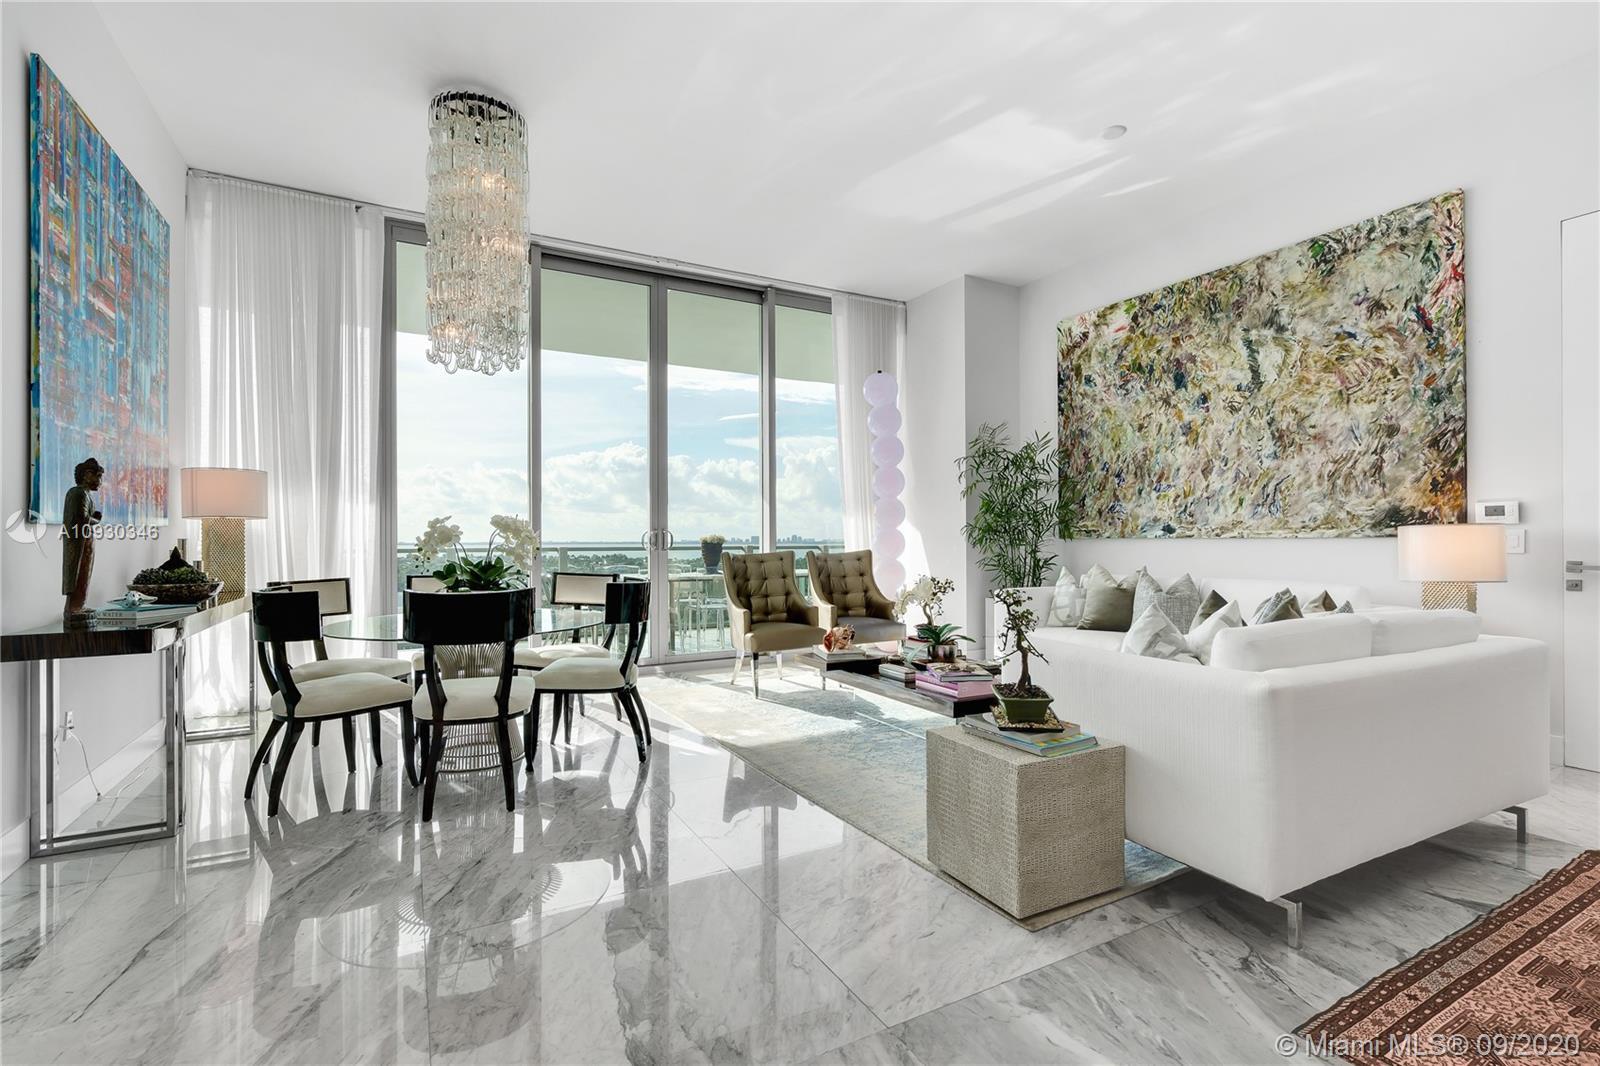 Real Estate Photo A10930346